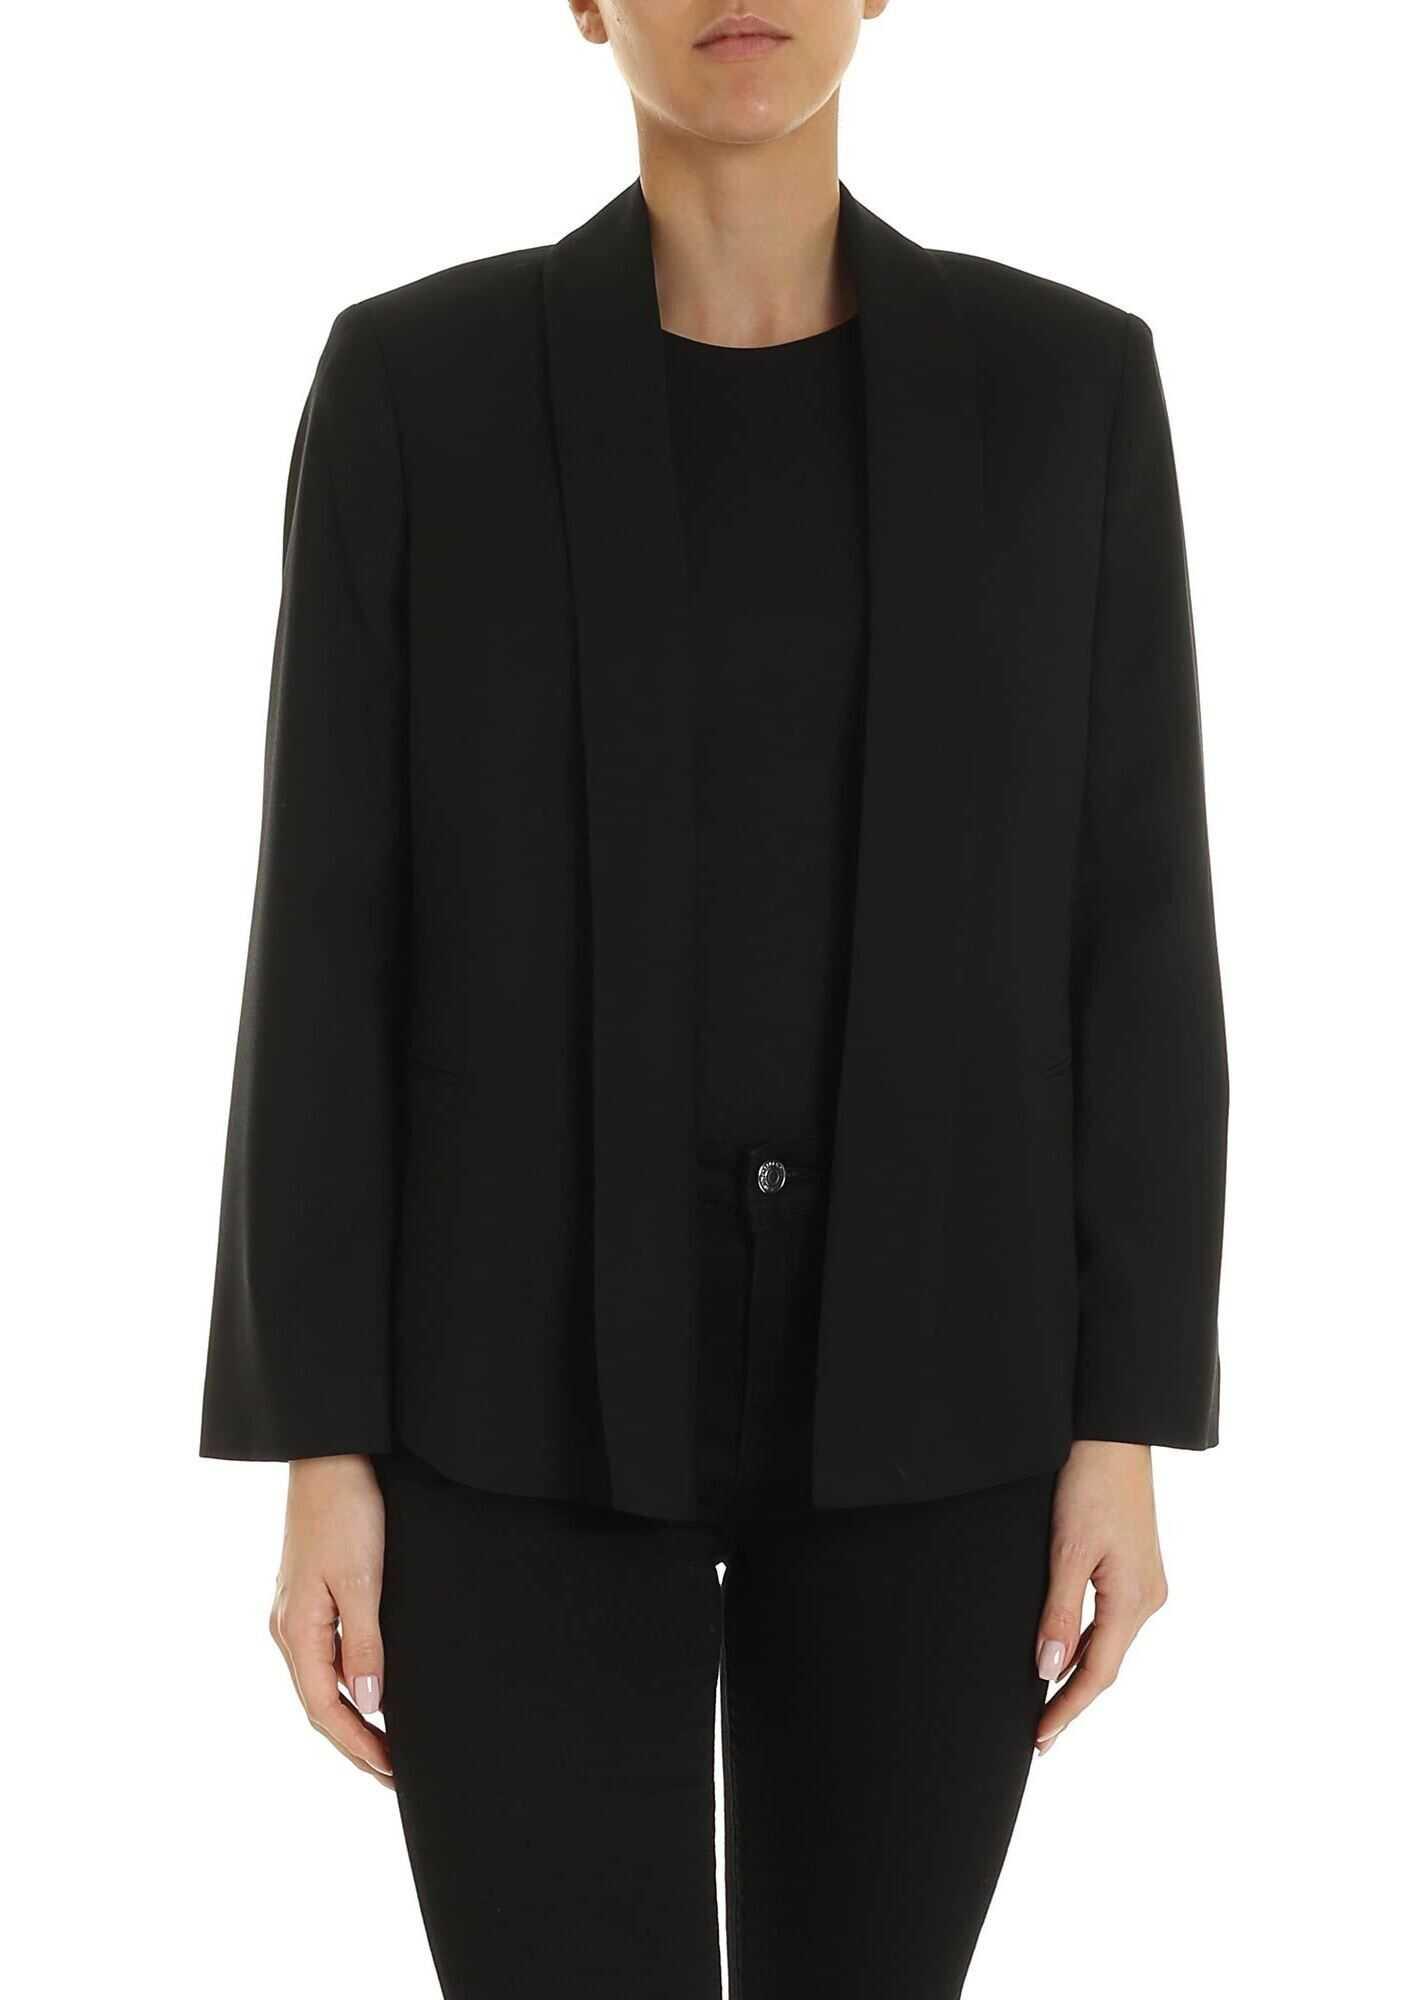 Semi-Lined Jacket In Black thumbnail